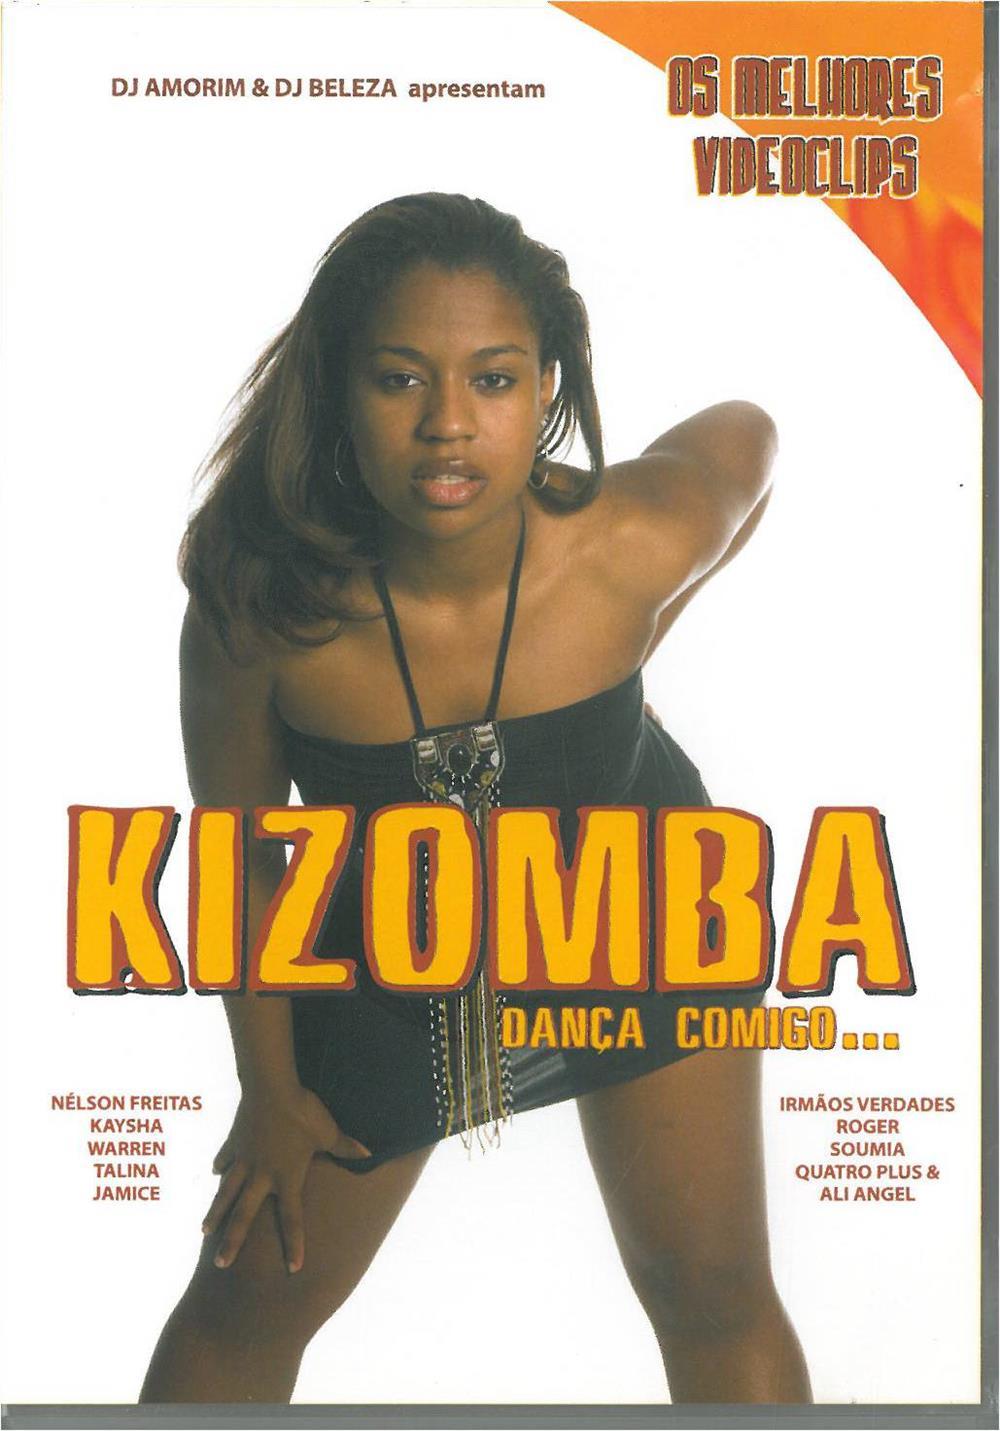 Kizomba_dança comigo_DVD.jpg